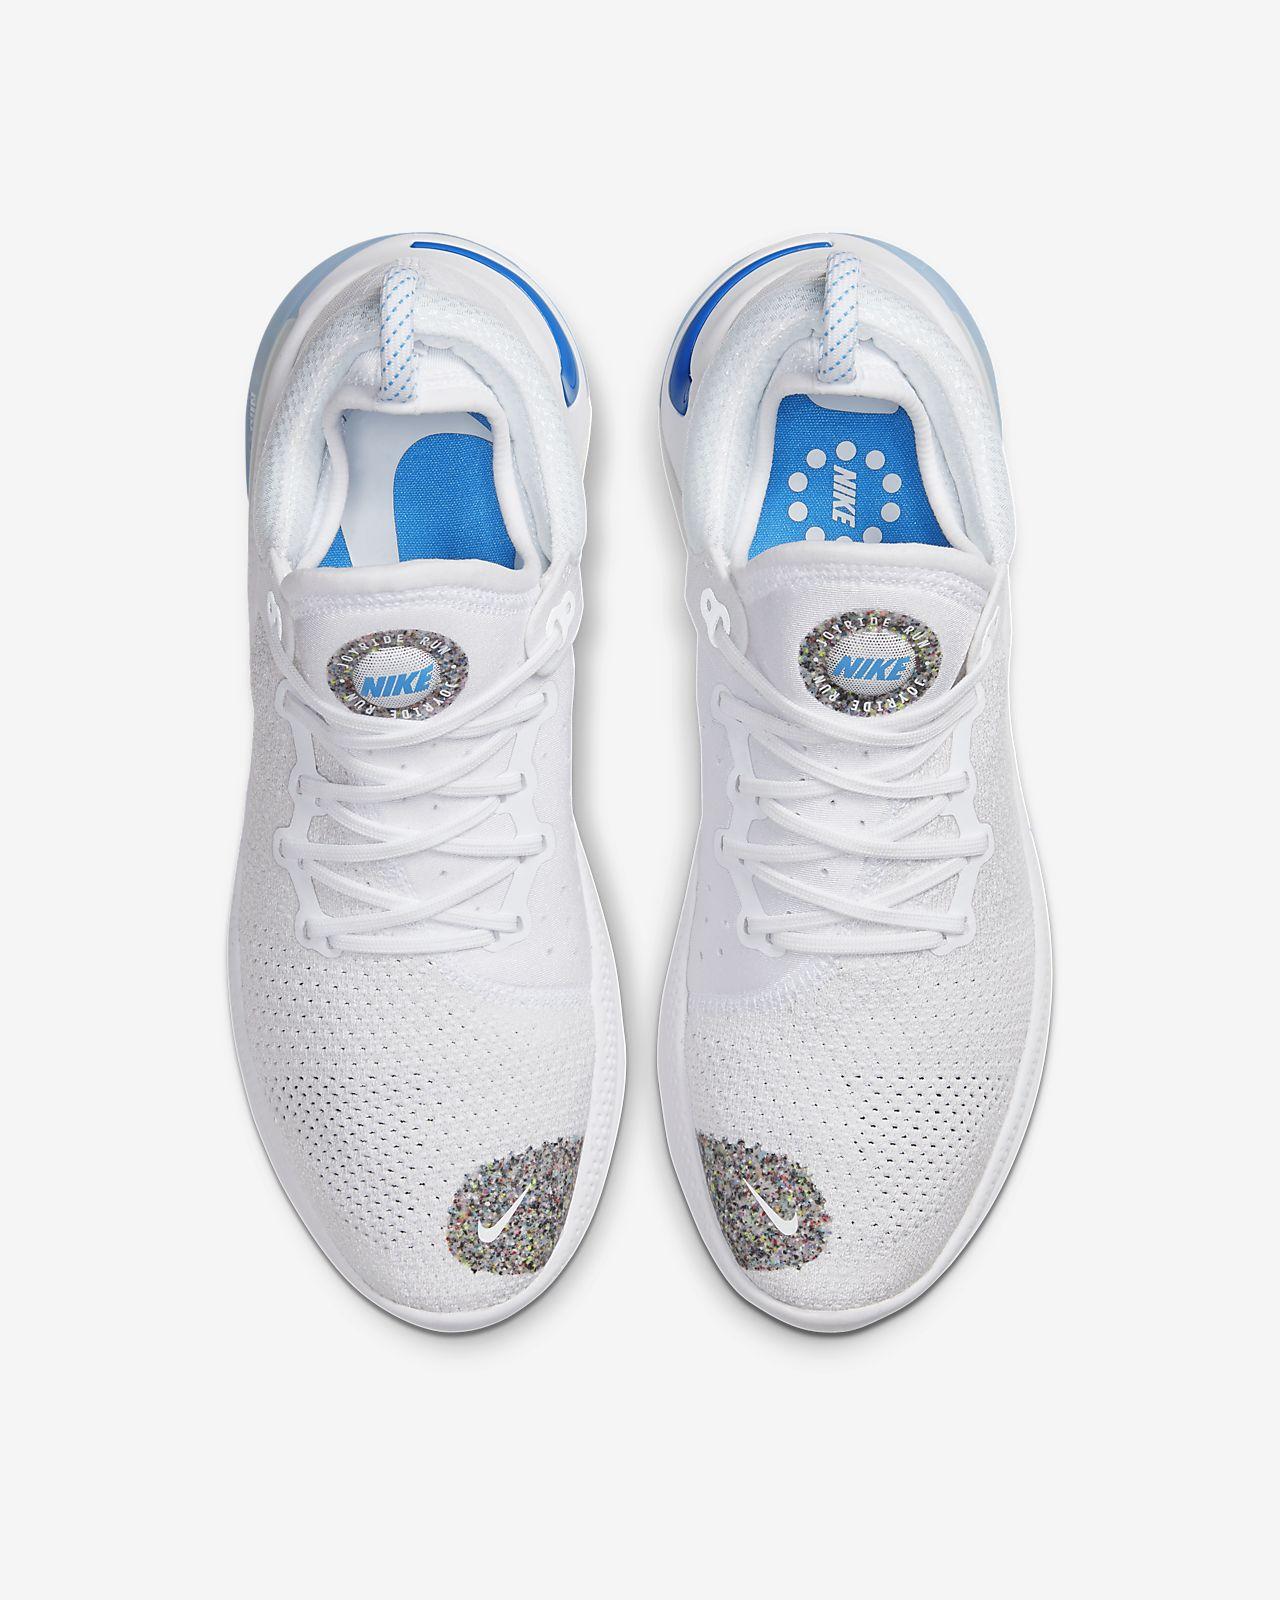 Nike Zoom Fly 3 AW Women's Shoes WhiteWhiteBlue Hero